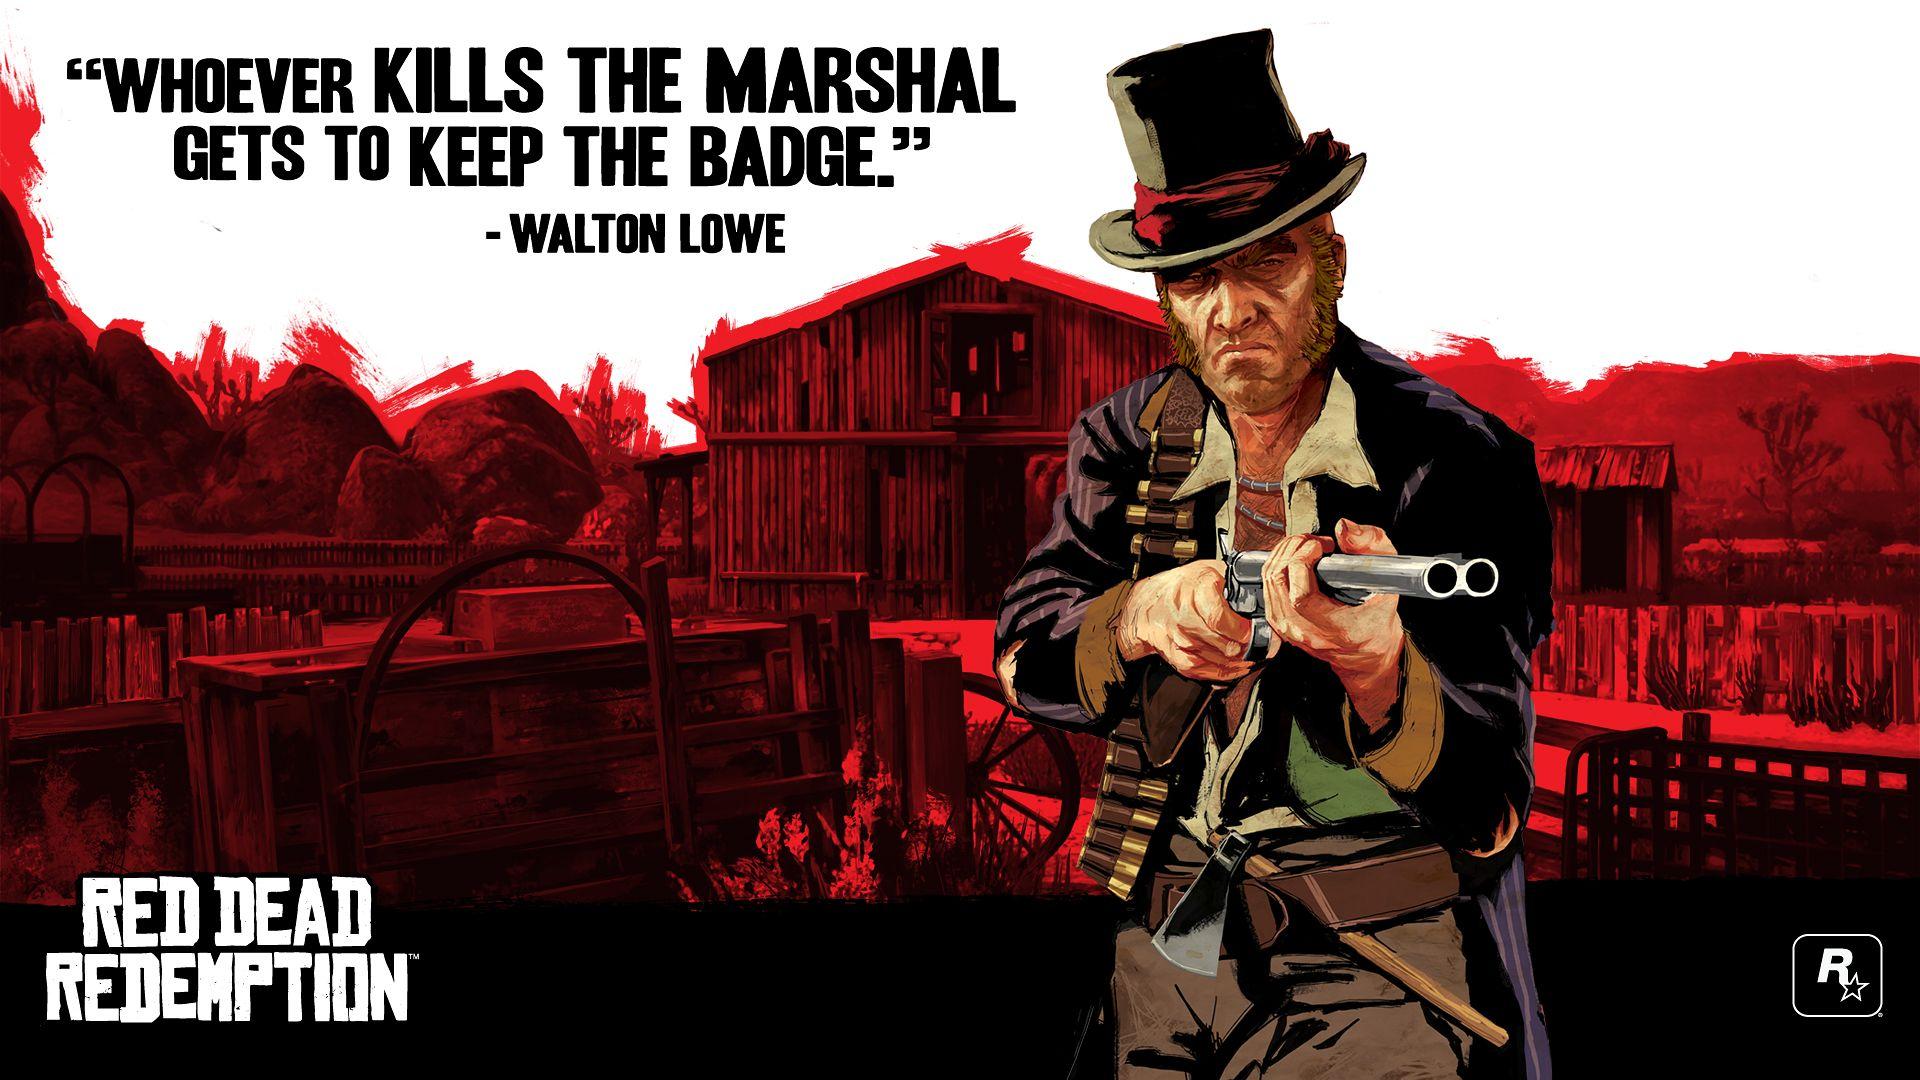 Red Dead Redemption Red Dead Redemption Wallpaper 13